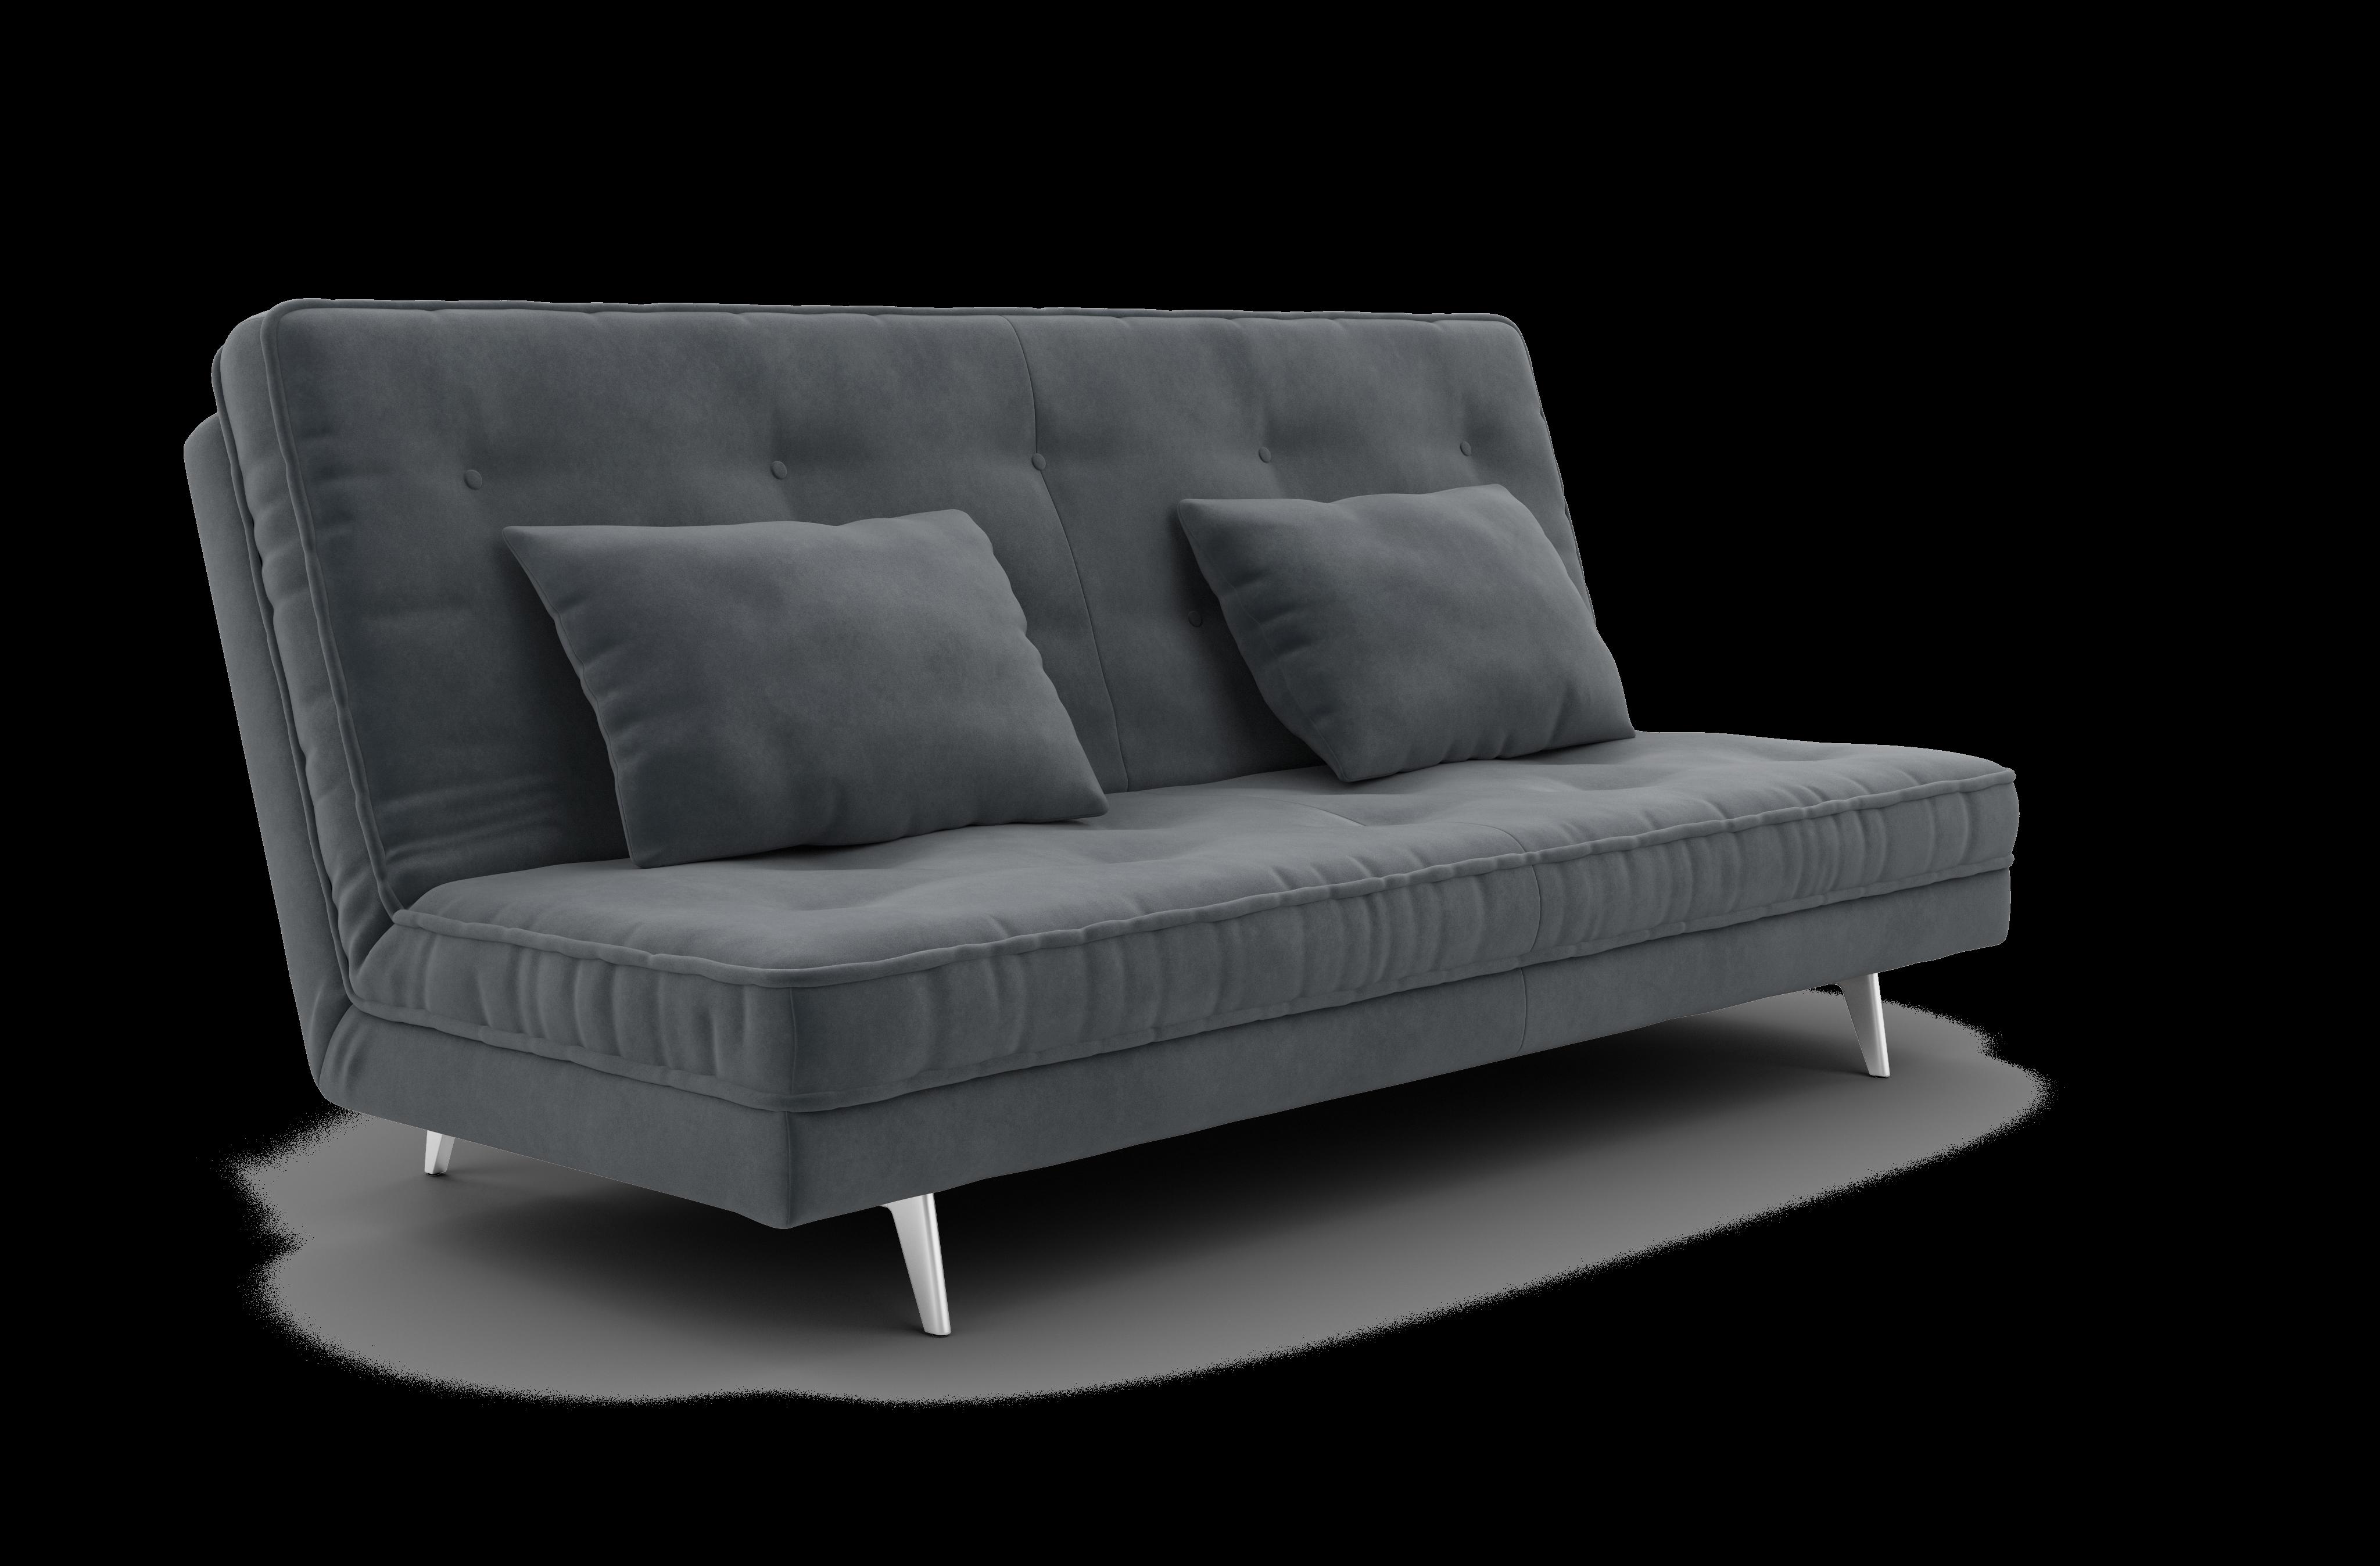 Nomade Express Ligne Roset Home Sofa Bed Sofa Bed